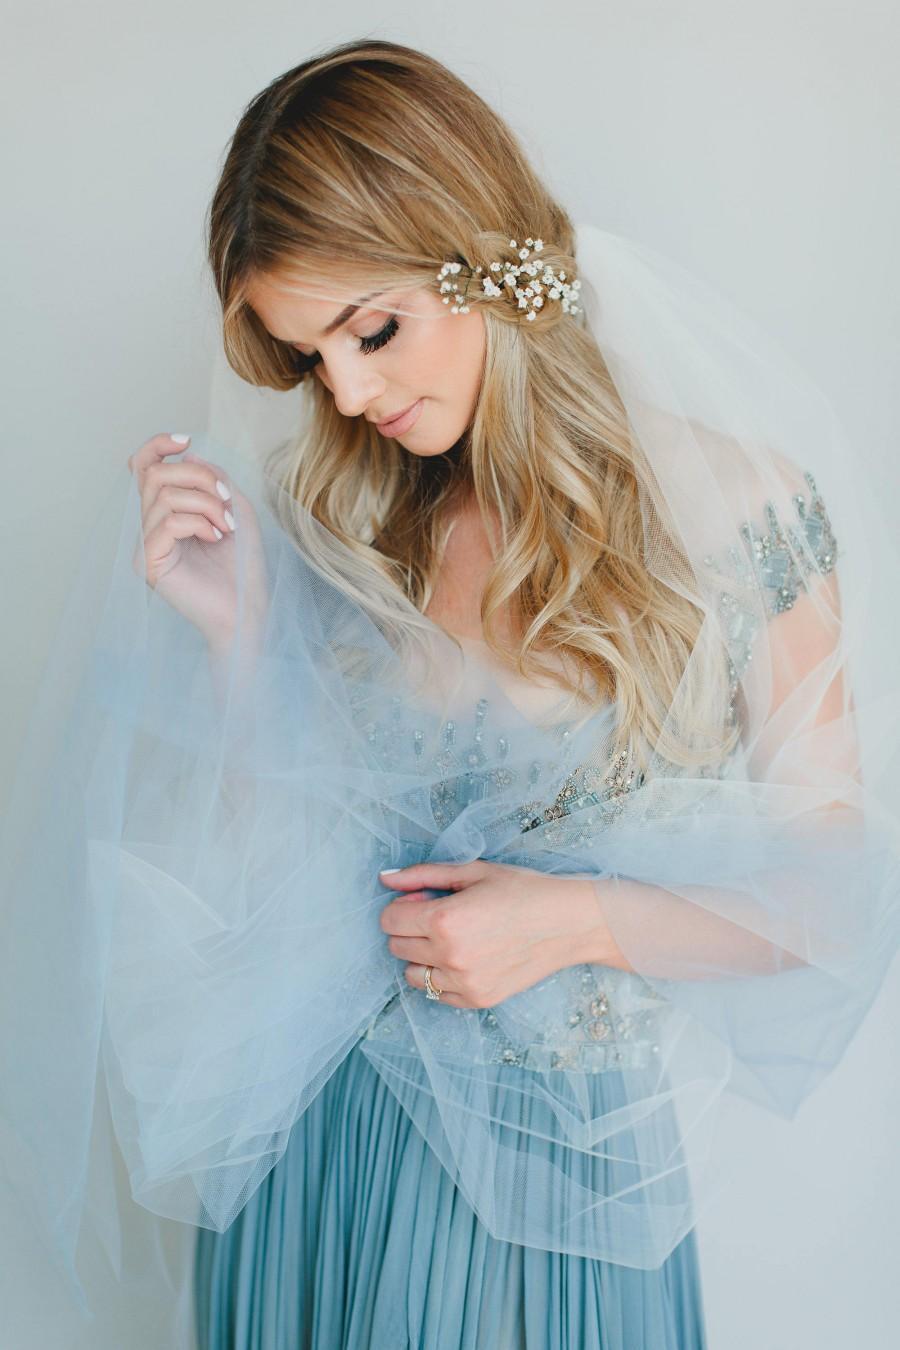 Wedding - Blue Ombre Veil, Hand Dyed Veil, Bridal Veil, Dip Dyed Veil, Cathedral Veil, Fingertip Bridal Veil, Tulle Veil, Blue Veil, Waltz Veil 1712